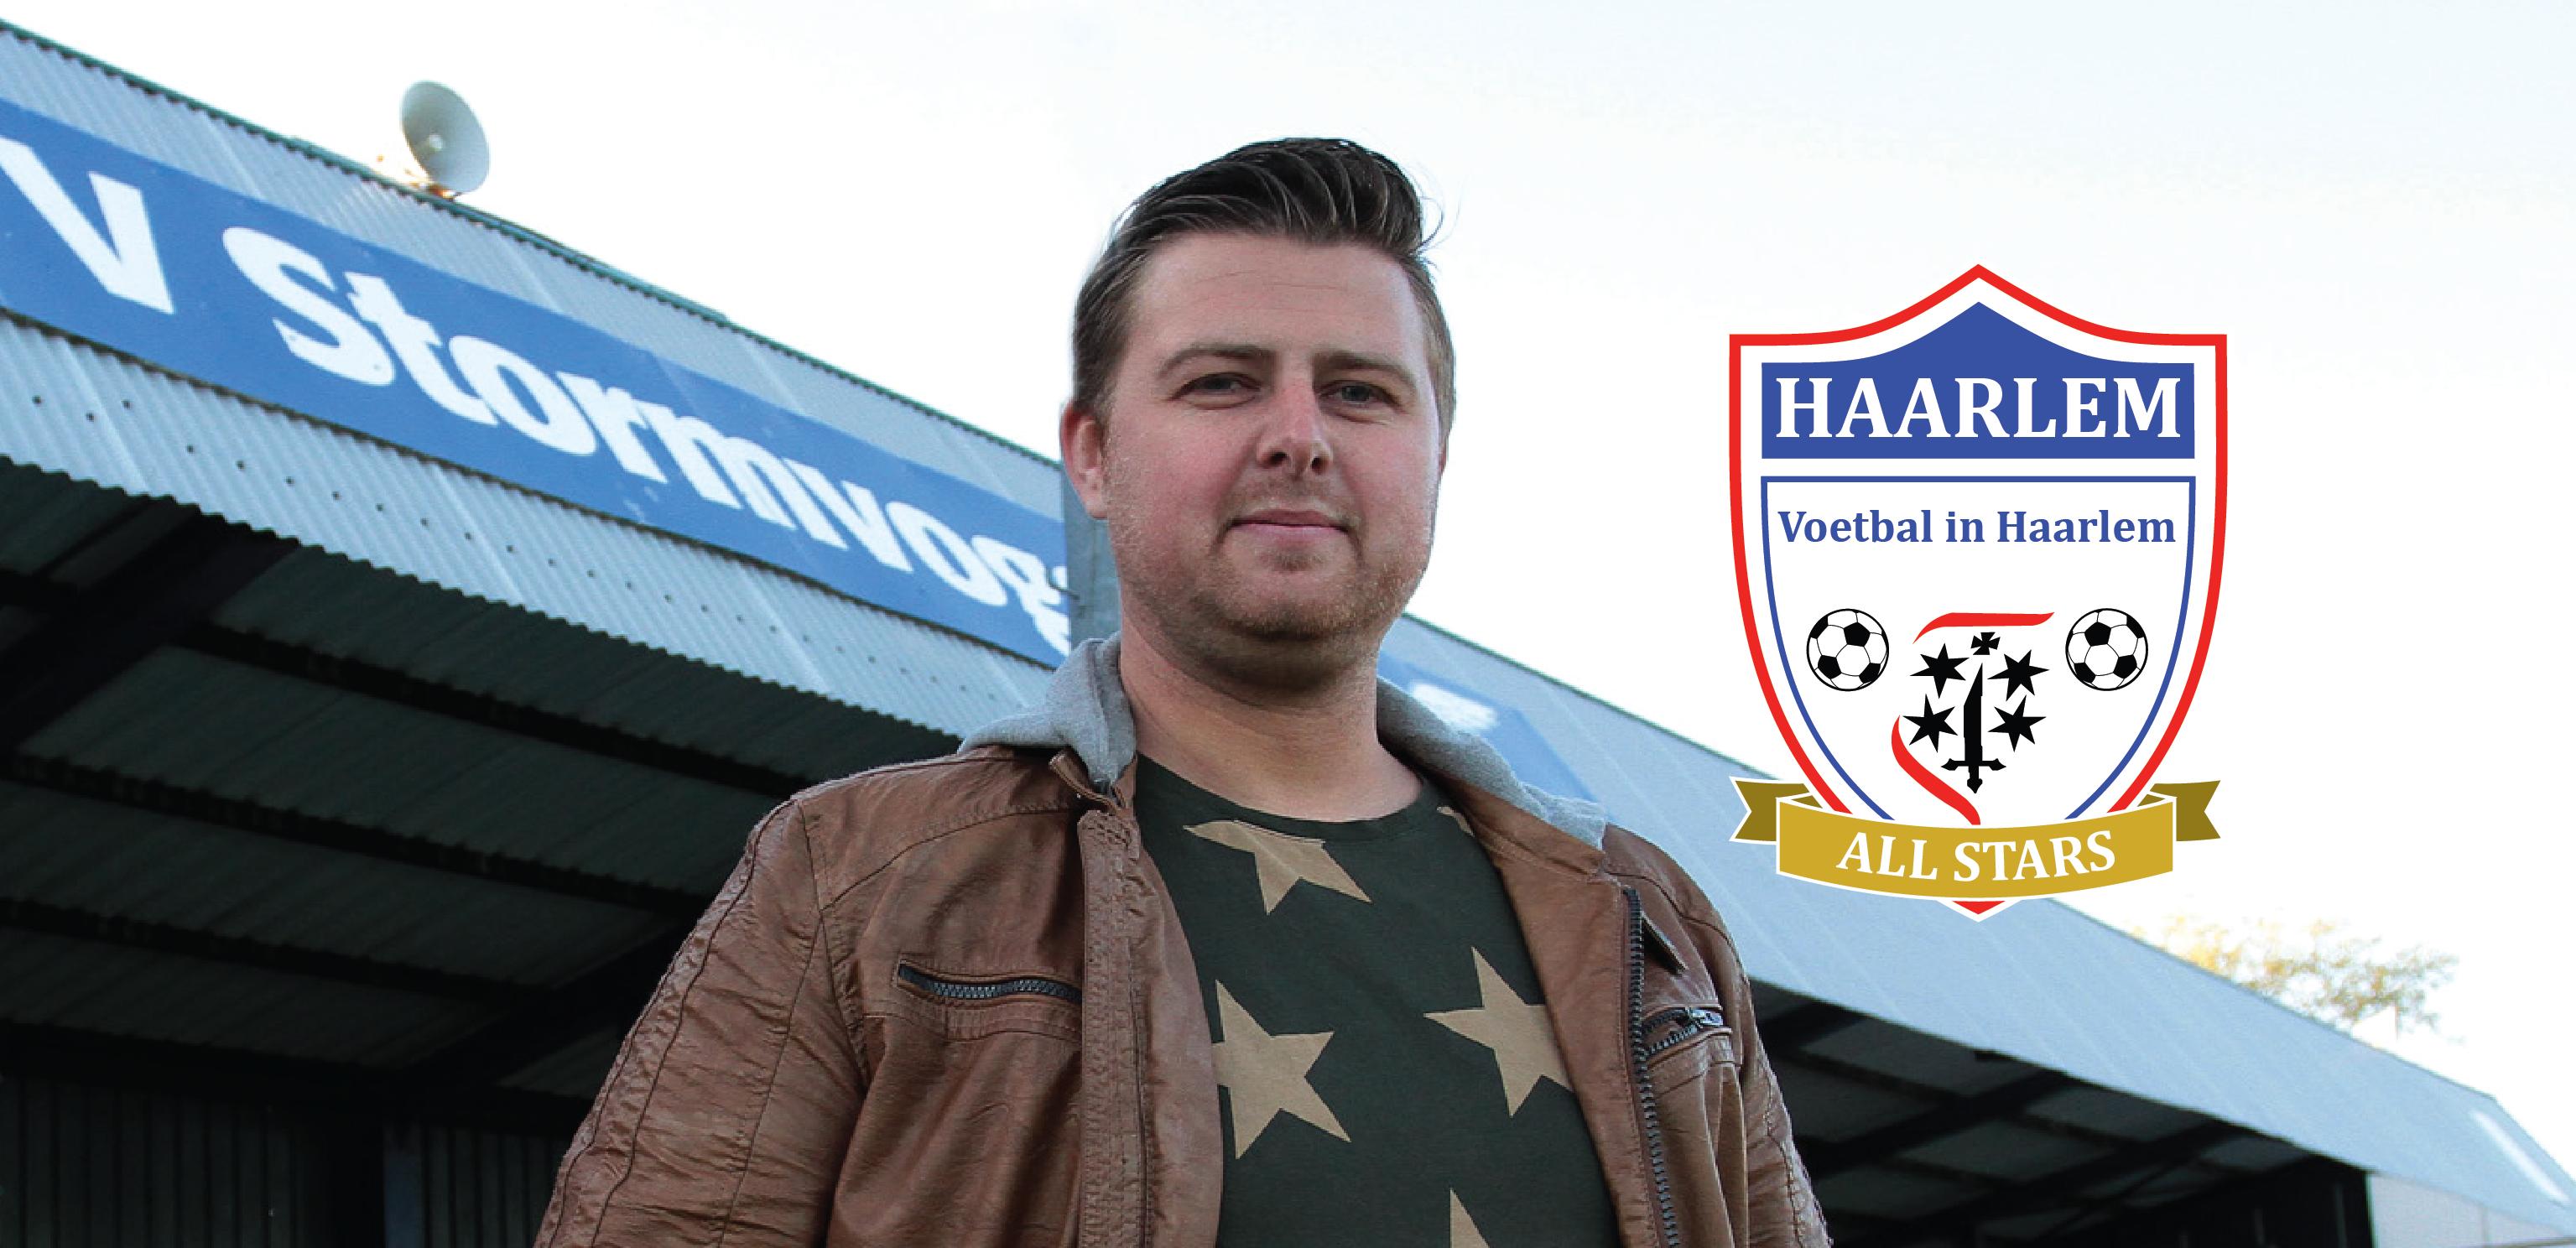 All Stars Ebbeling - Voetbal in Haarlem